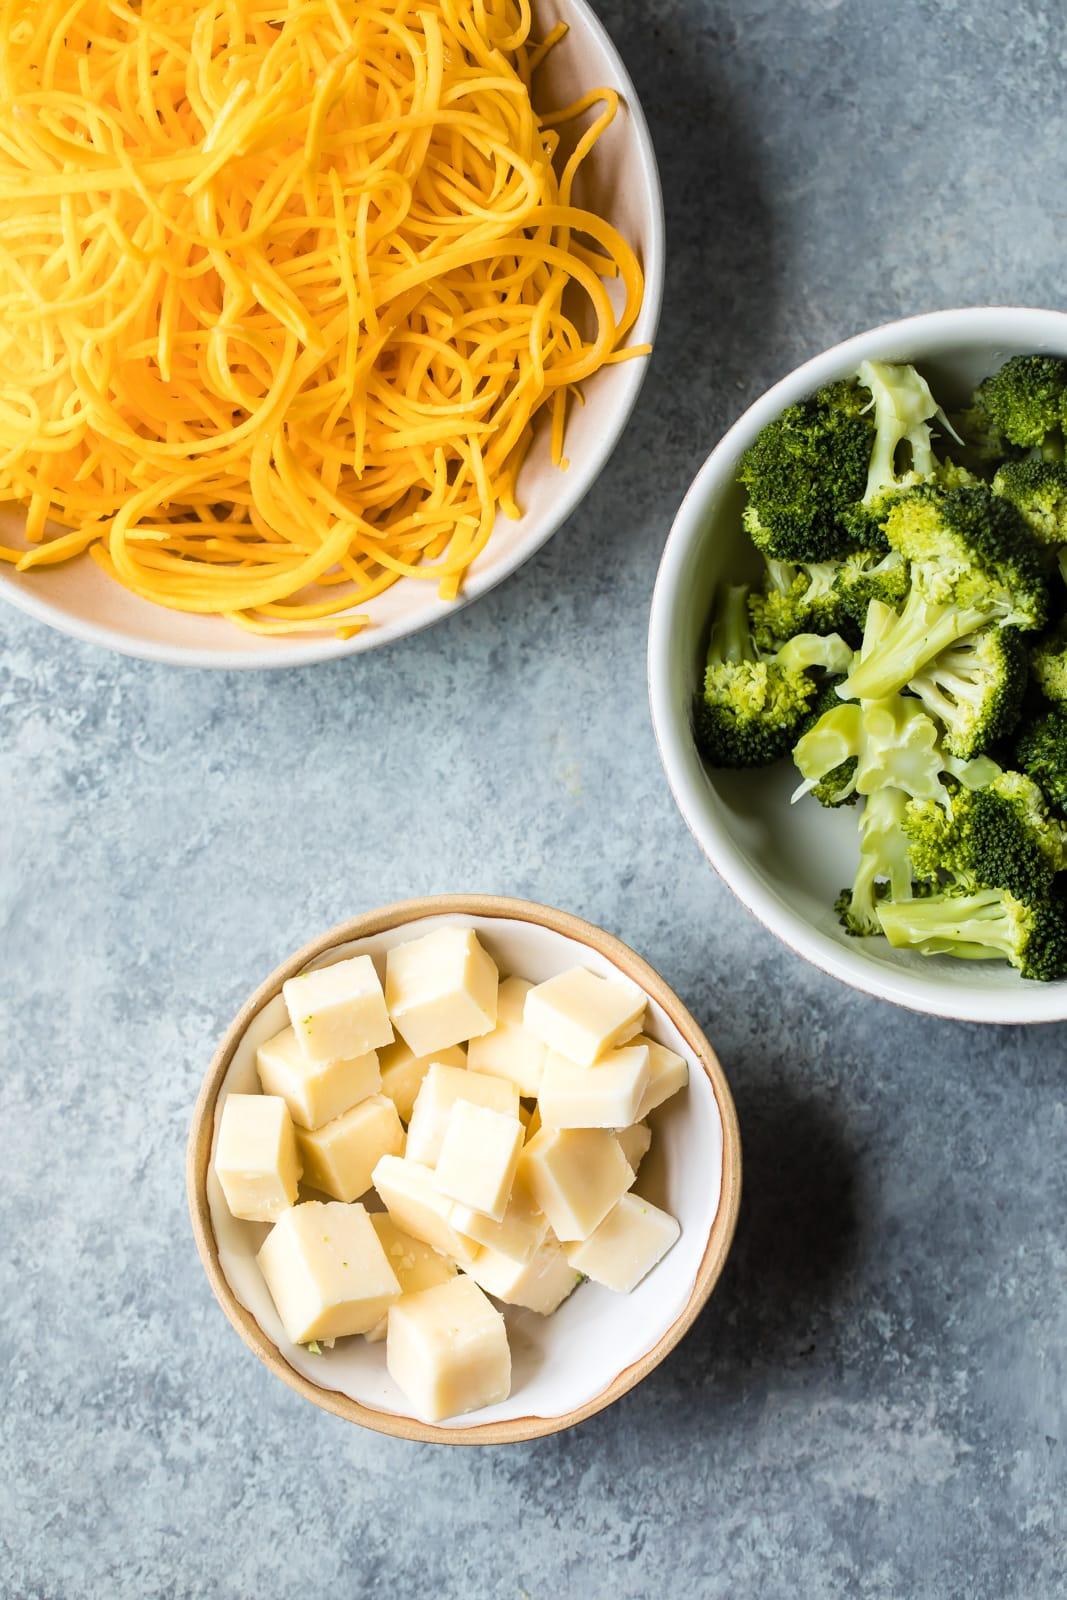 Broccoli & Butternut Squash Noodle 'Mac & Cheese'